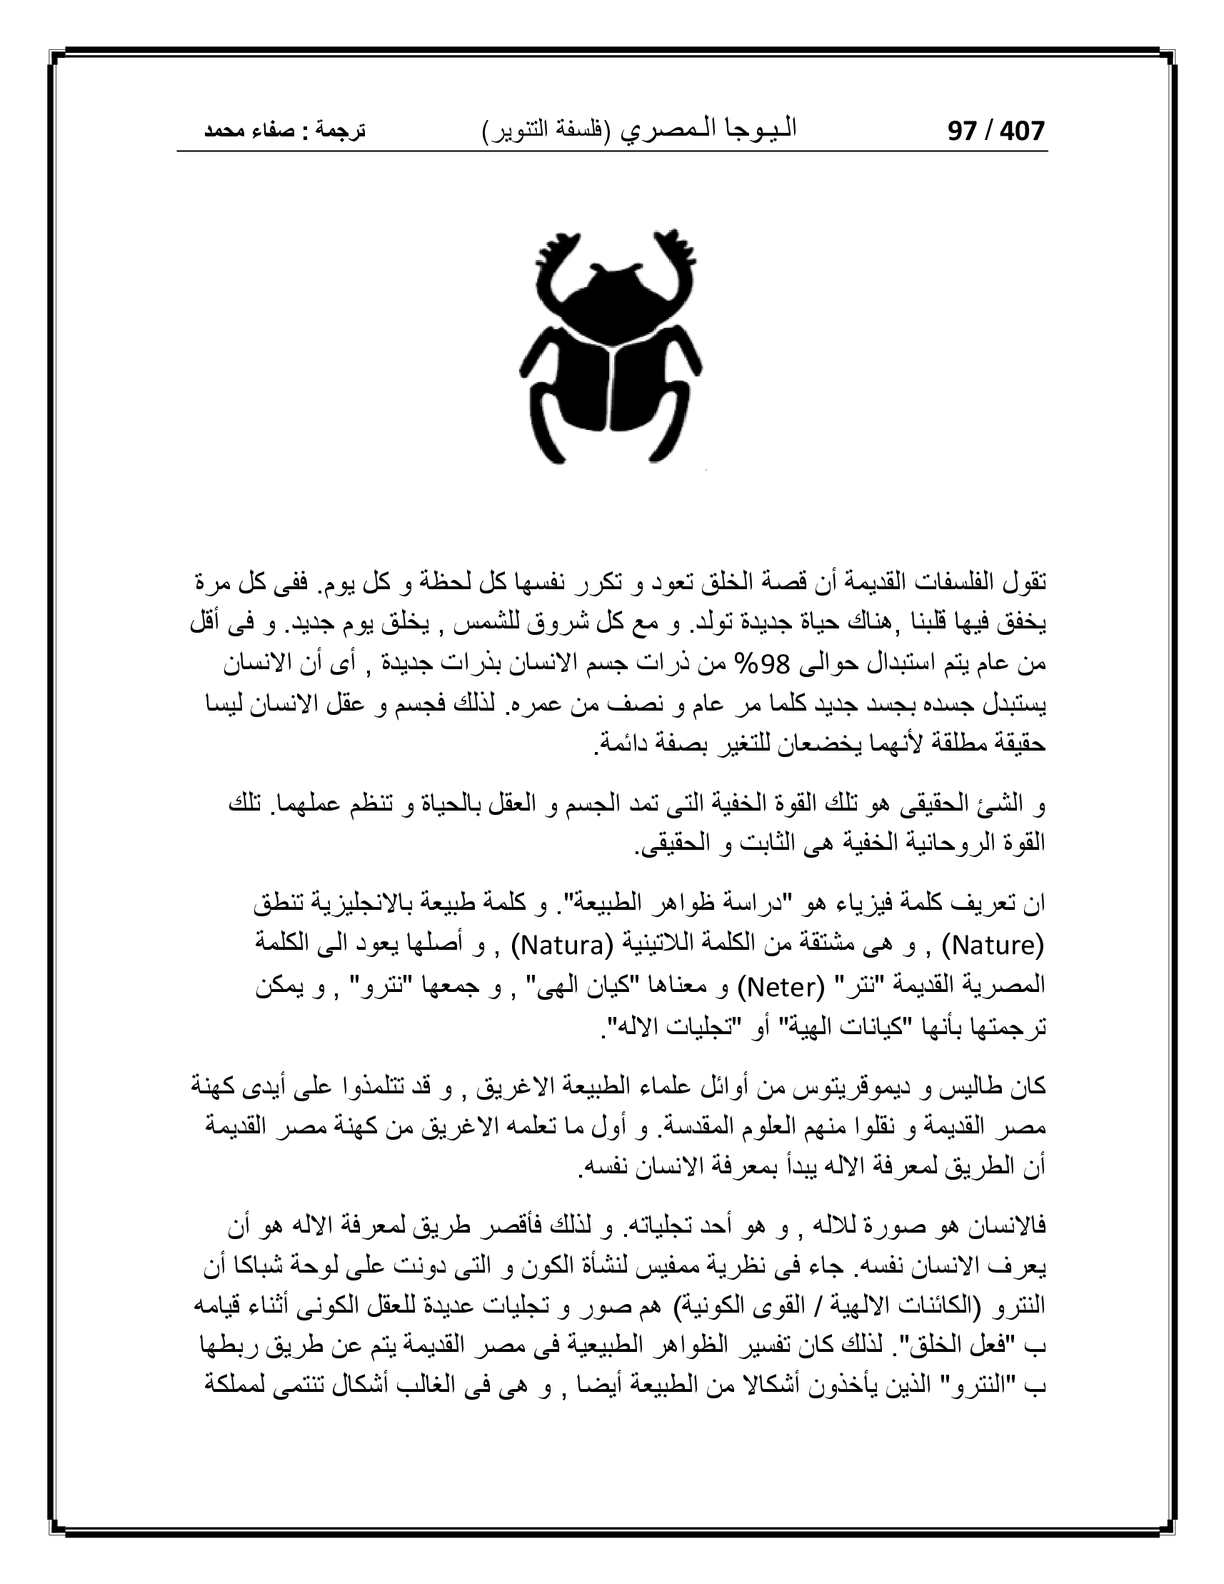 كتاب يوجا المصري لمواتا أشابي Calameo Downloader